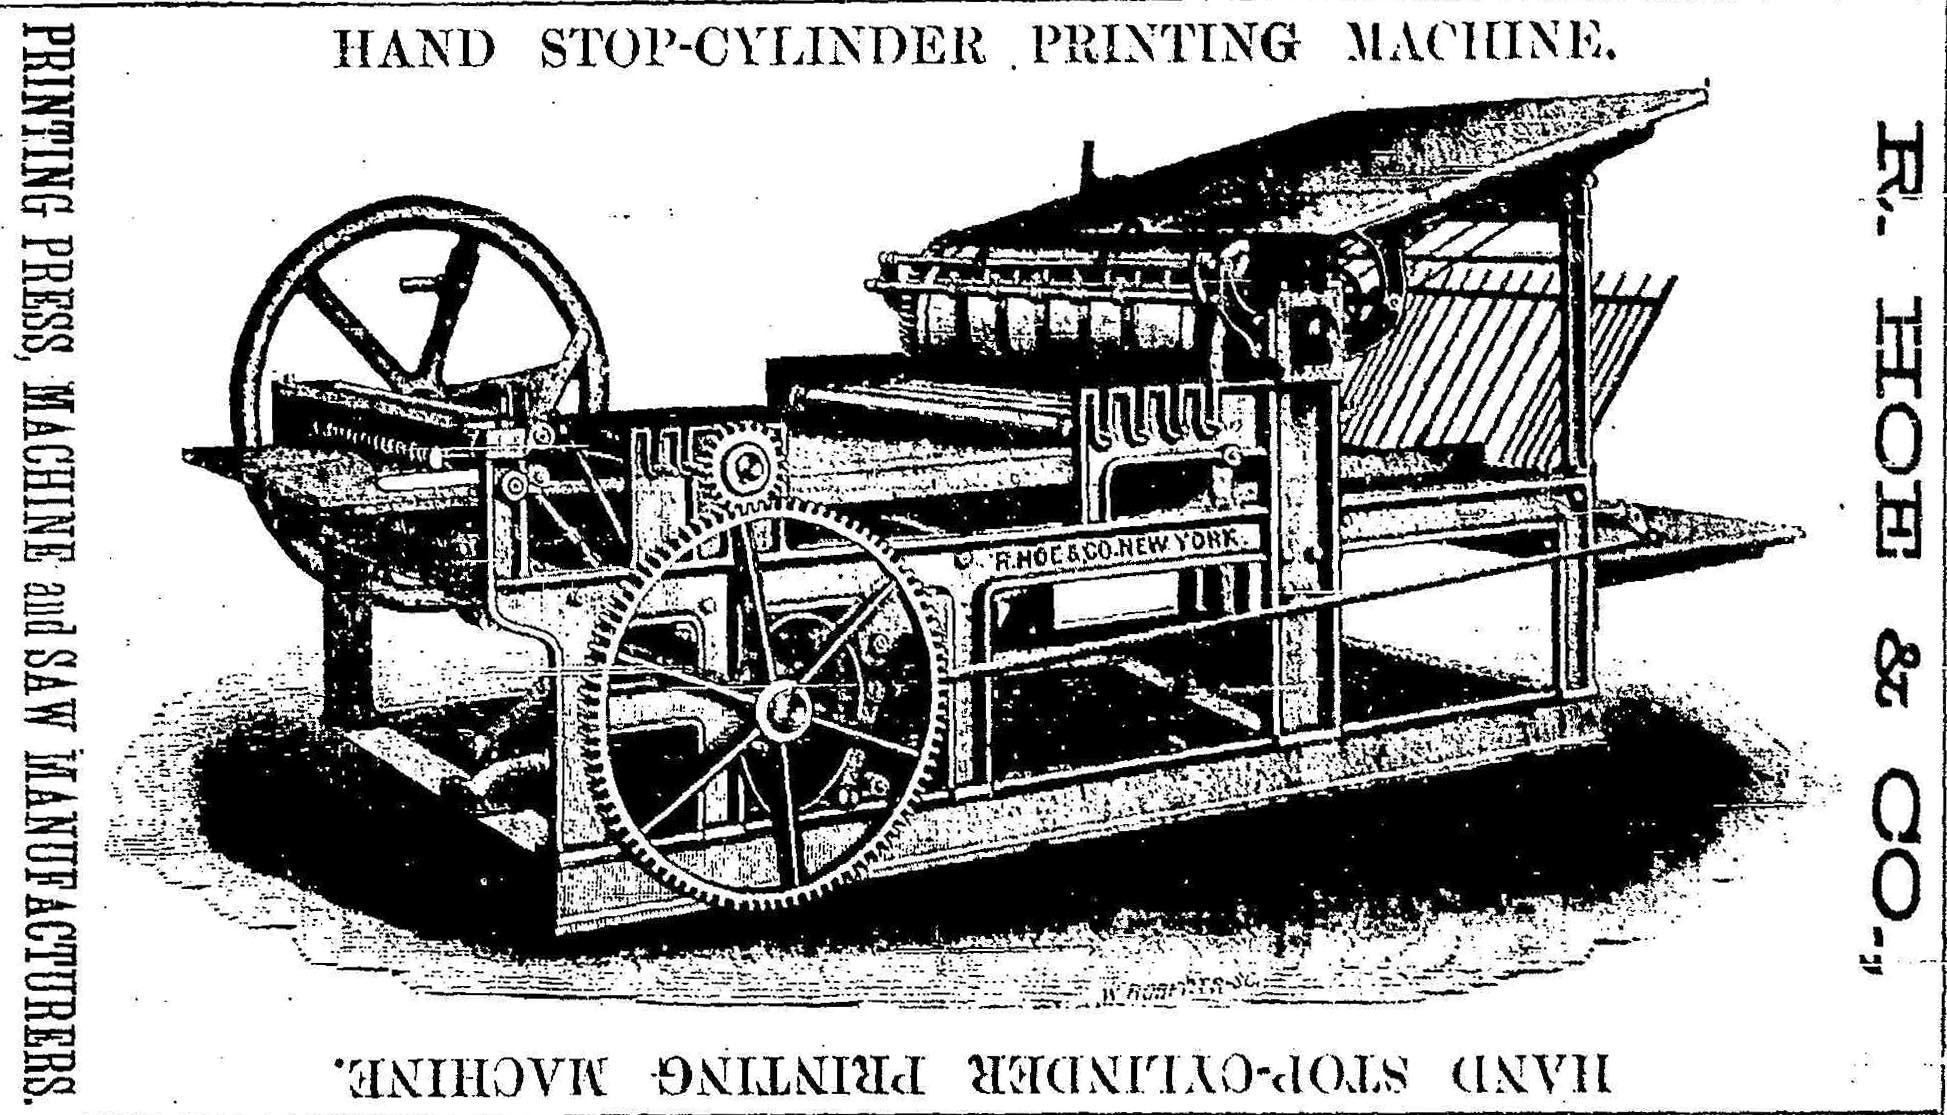 r-hoe-hand-stop-cylinder-printer-18741